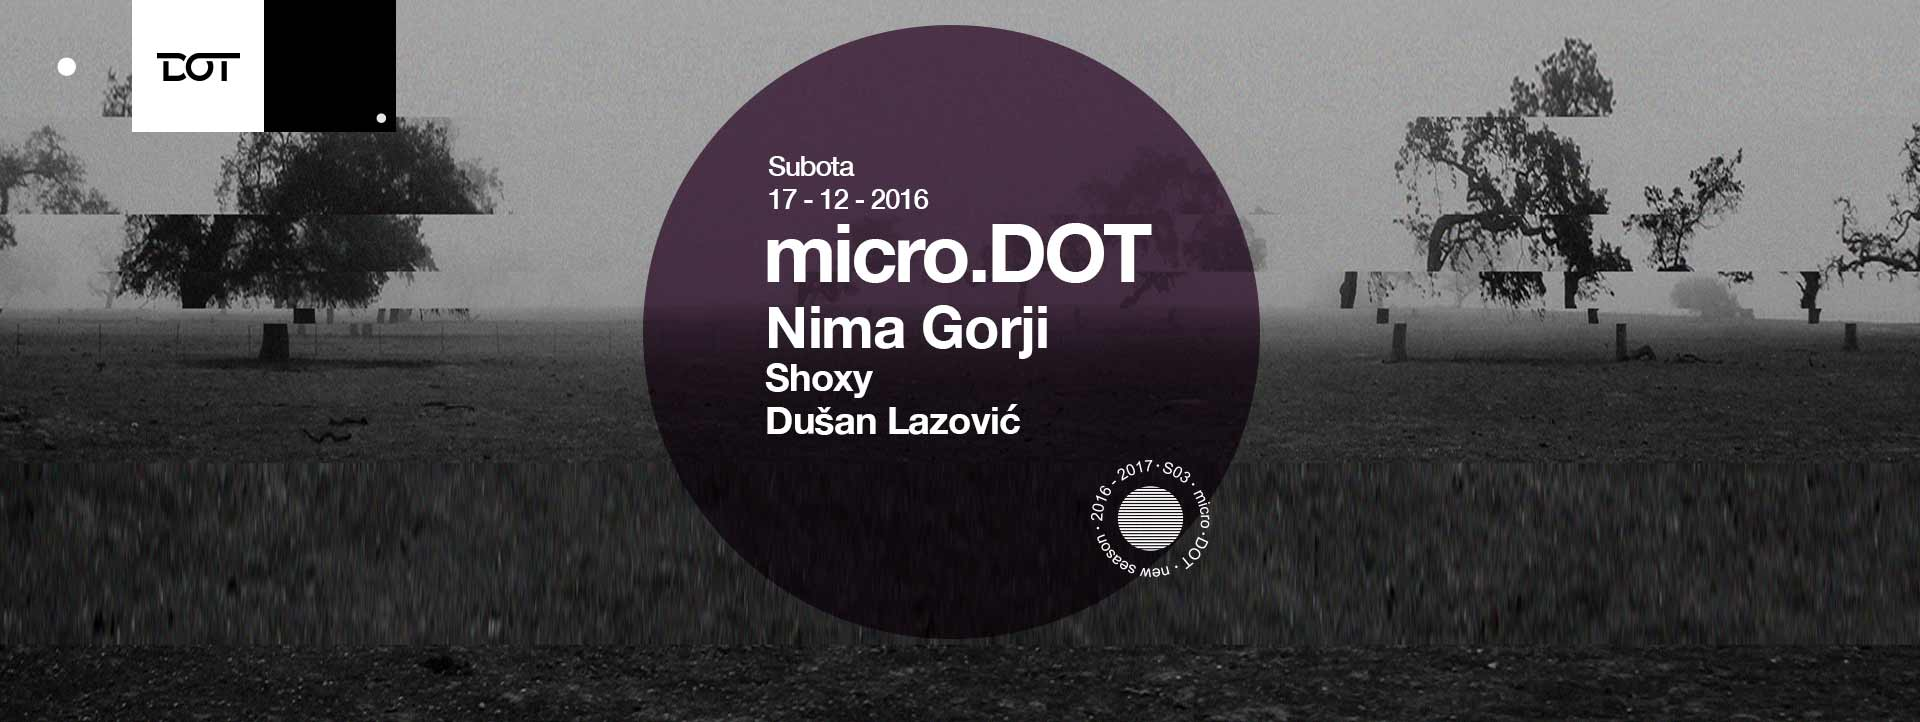 micro.DOT